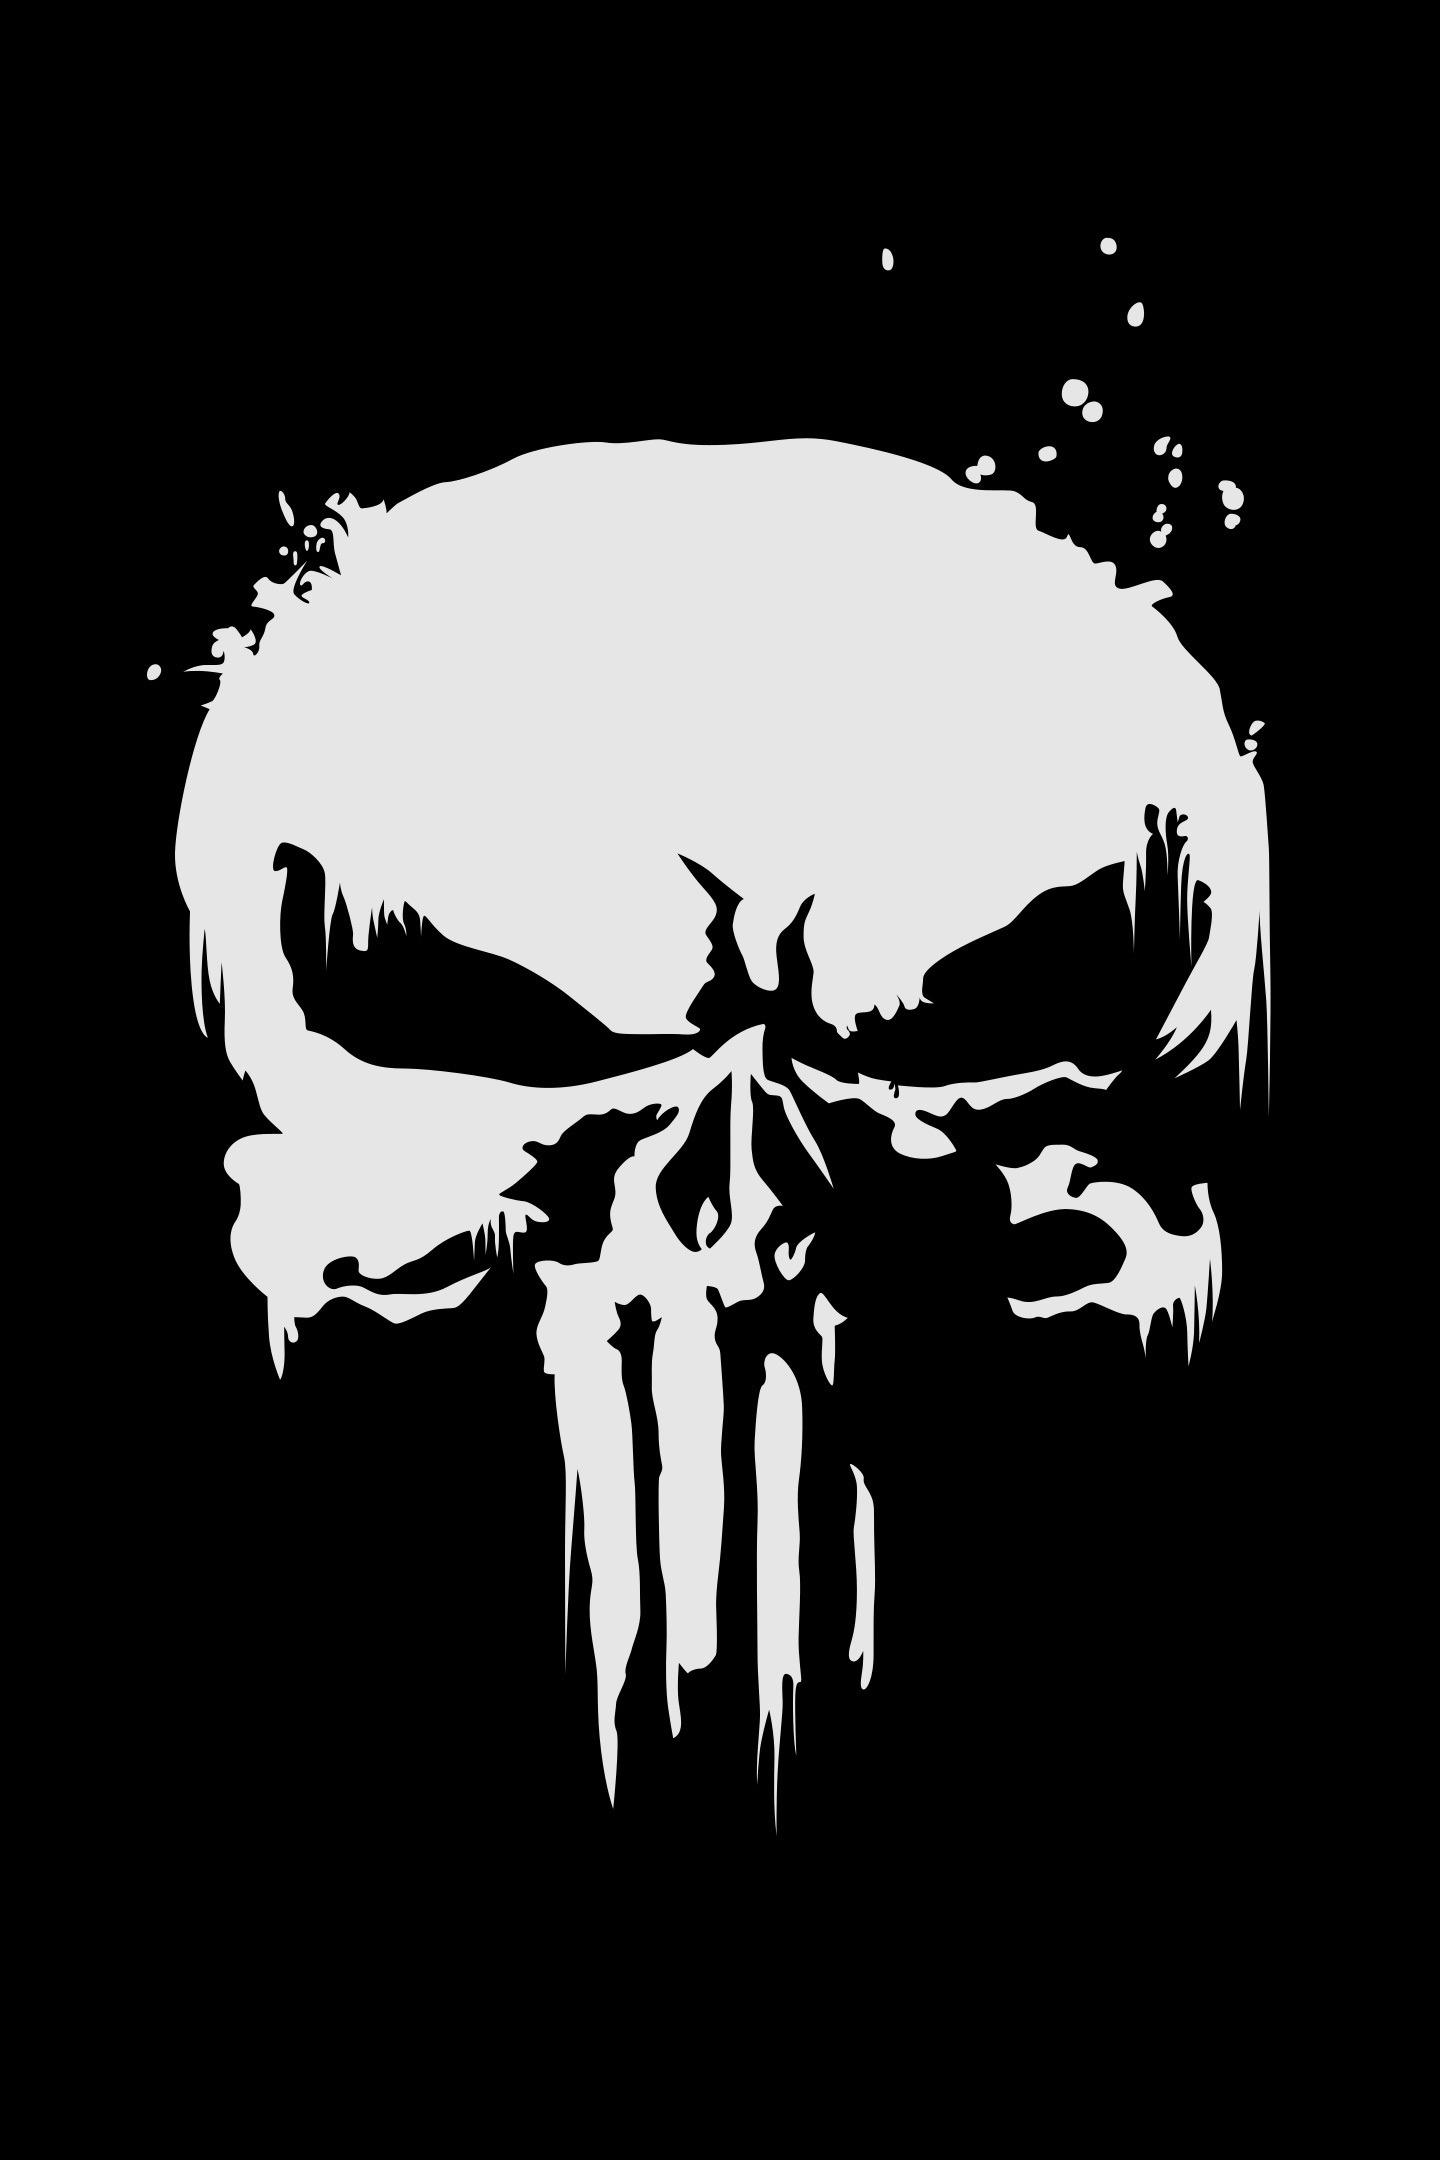 Download 1440x2960 Wallpaper The Punisher Logo Skull